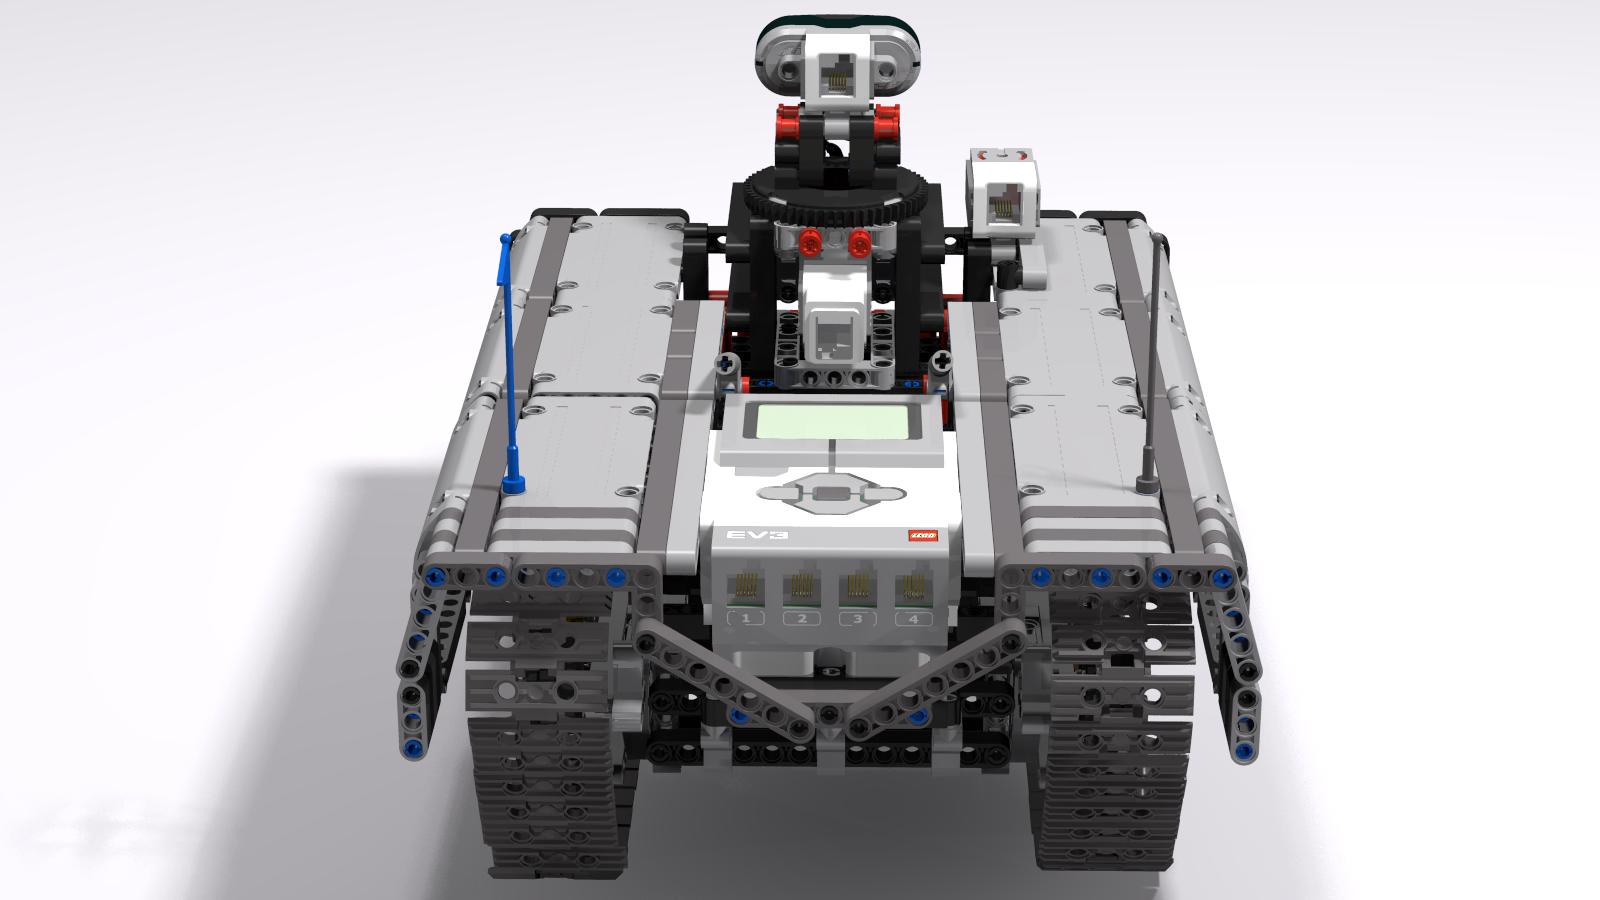 Ev3 Tracked Explorer Mark II - Back raised View